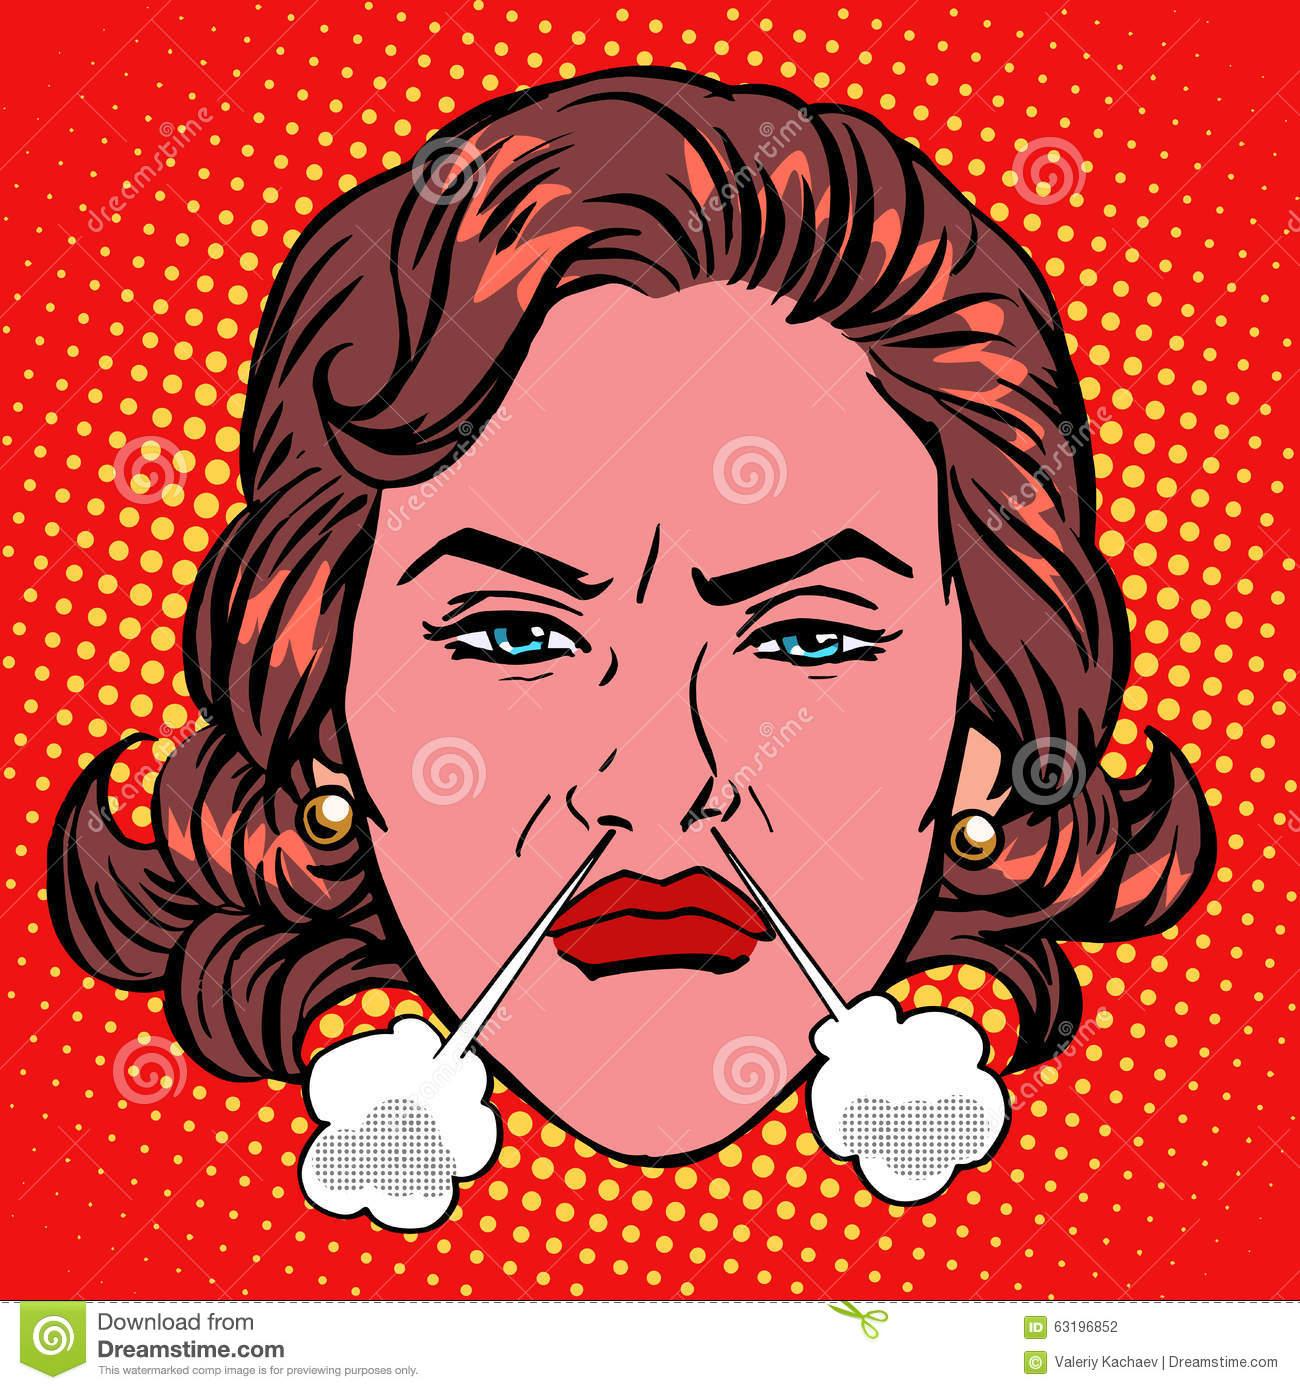 retro-emoji-rage-anger-boiling-woman-face-pop-art-style-63196852